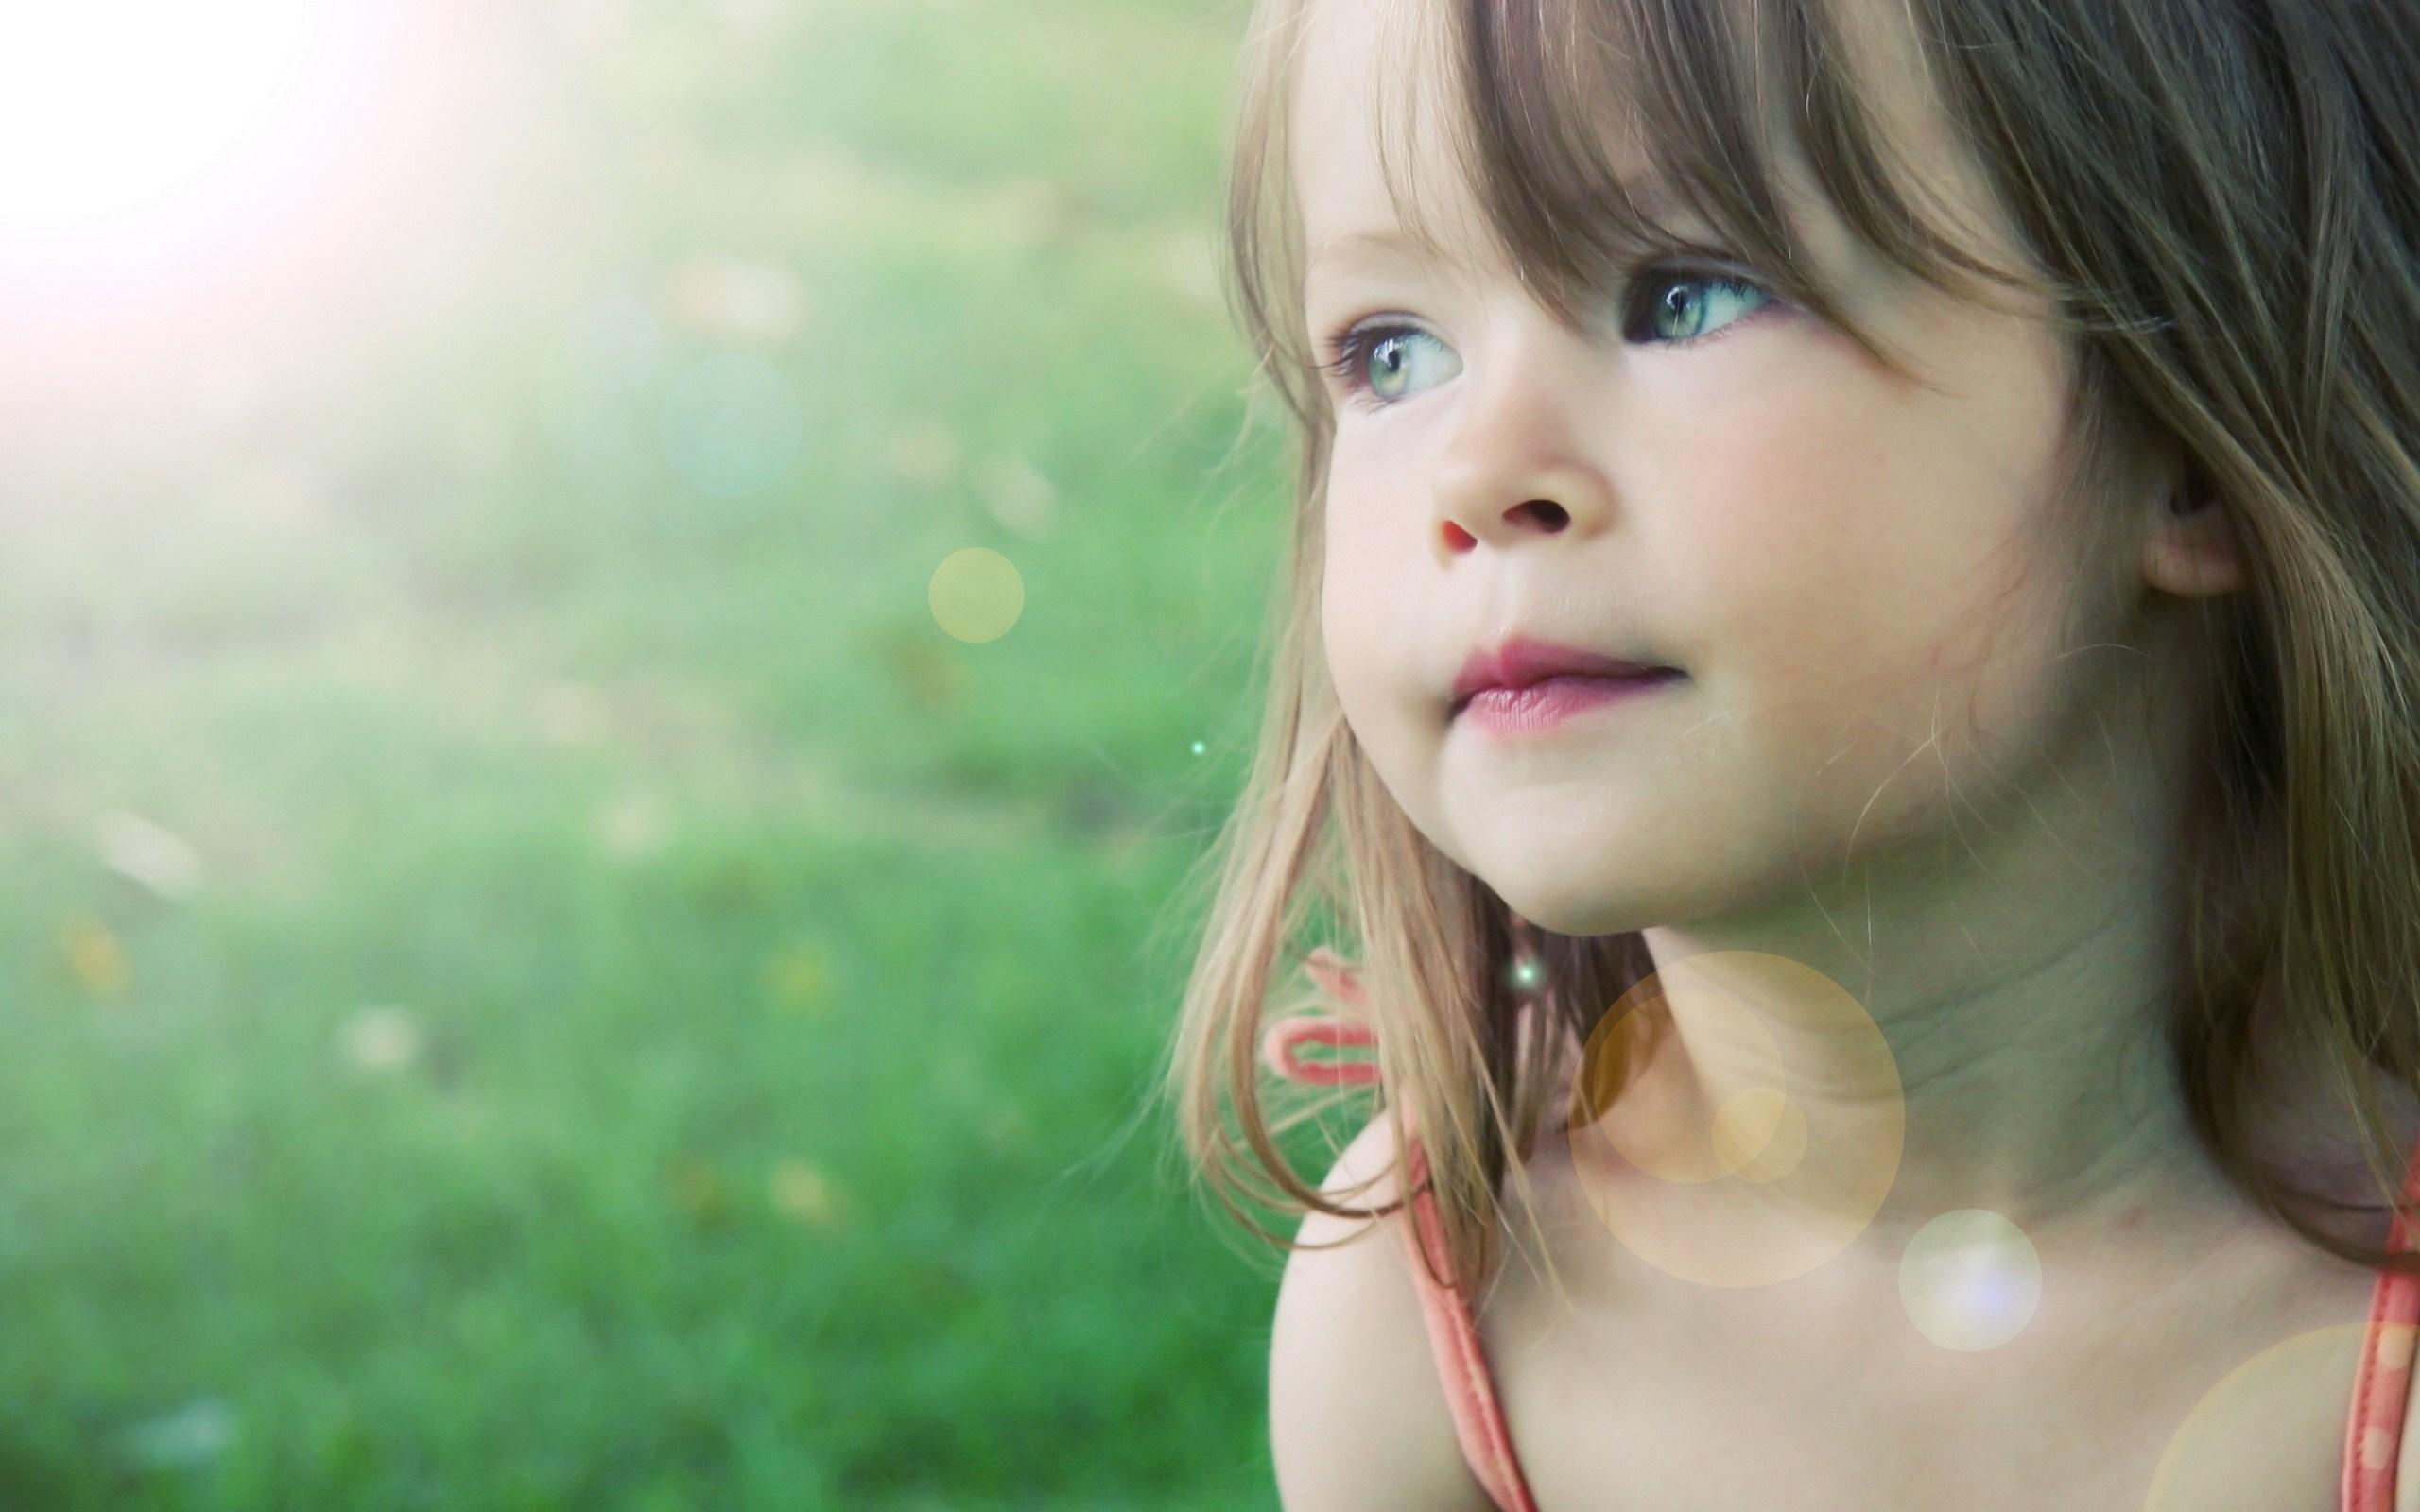 Child wallpaper wallpapersafari - Cute little girl pic hd ...